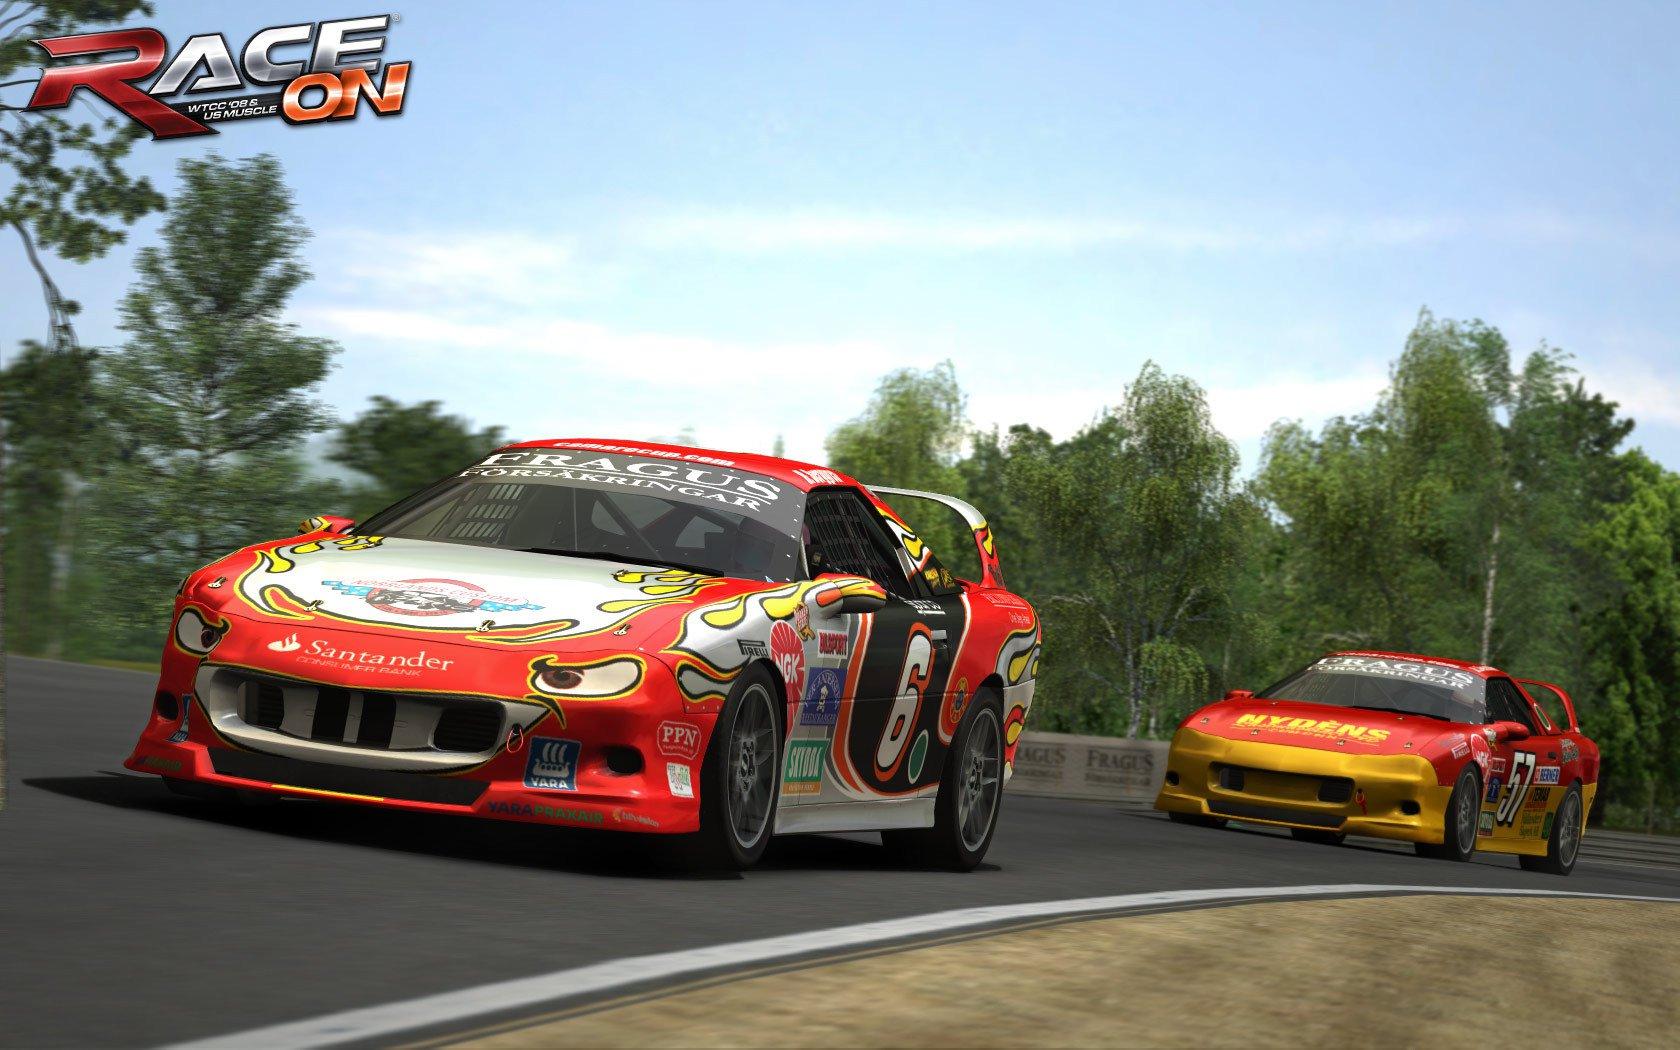 RACE On 21